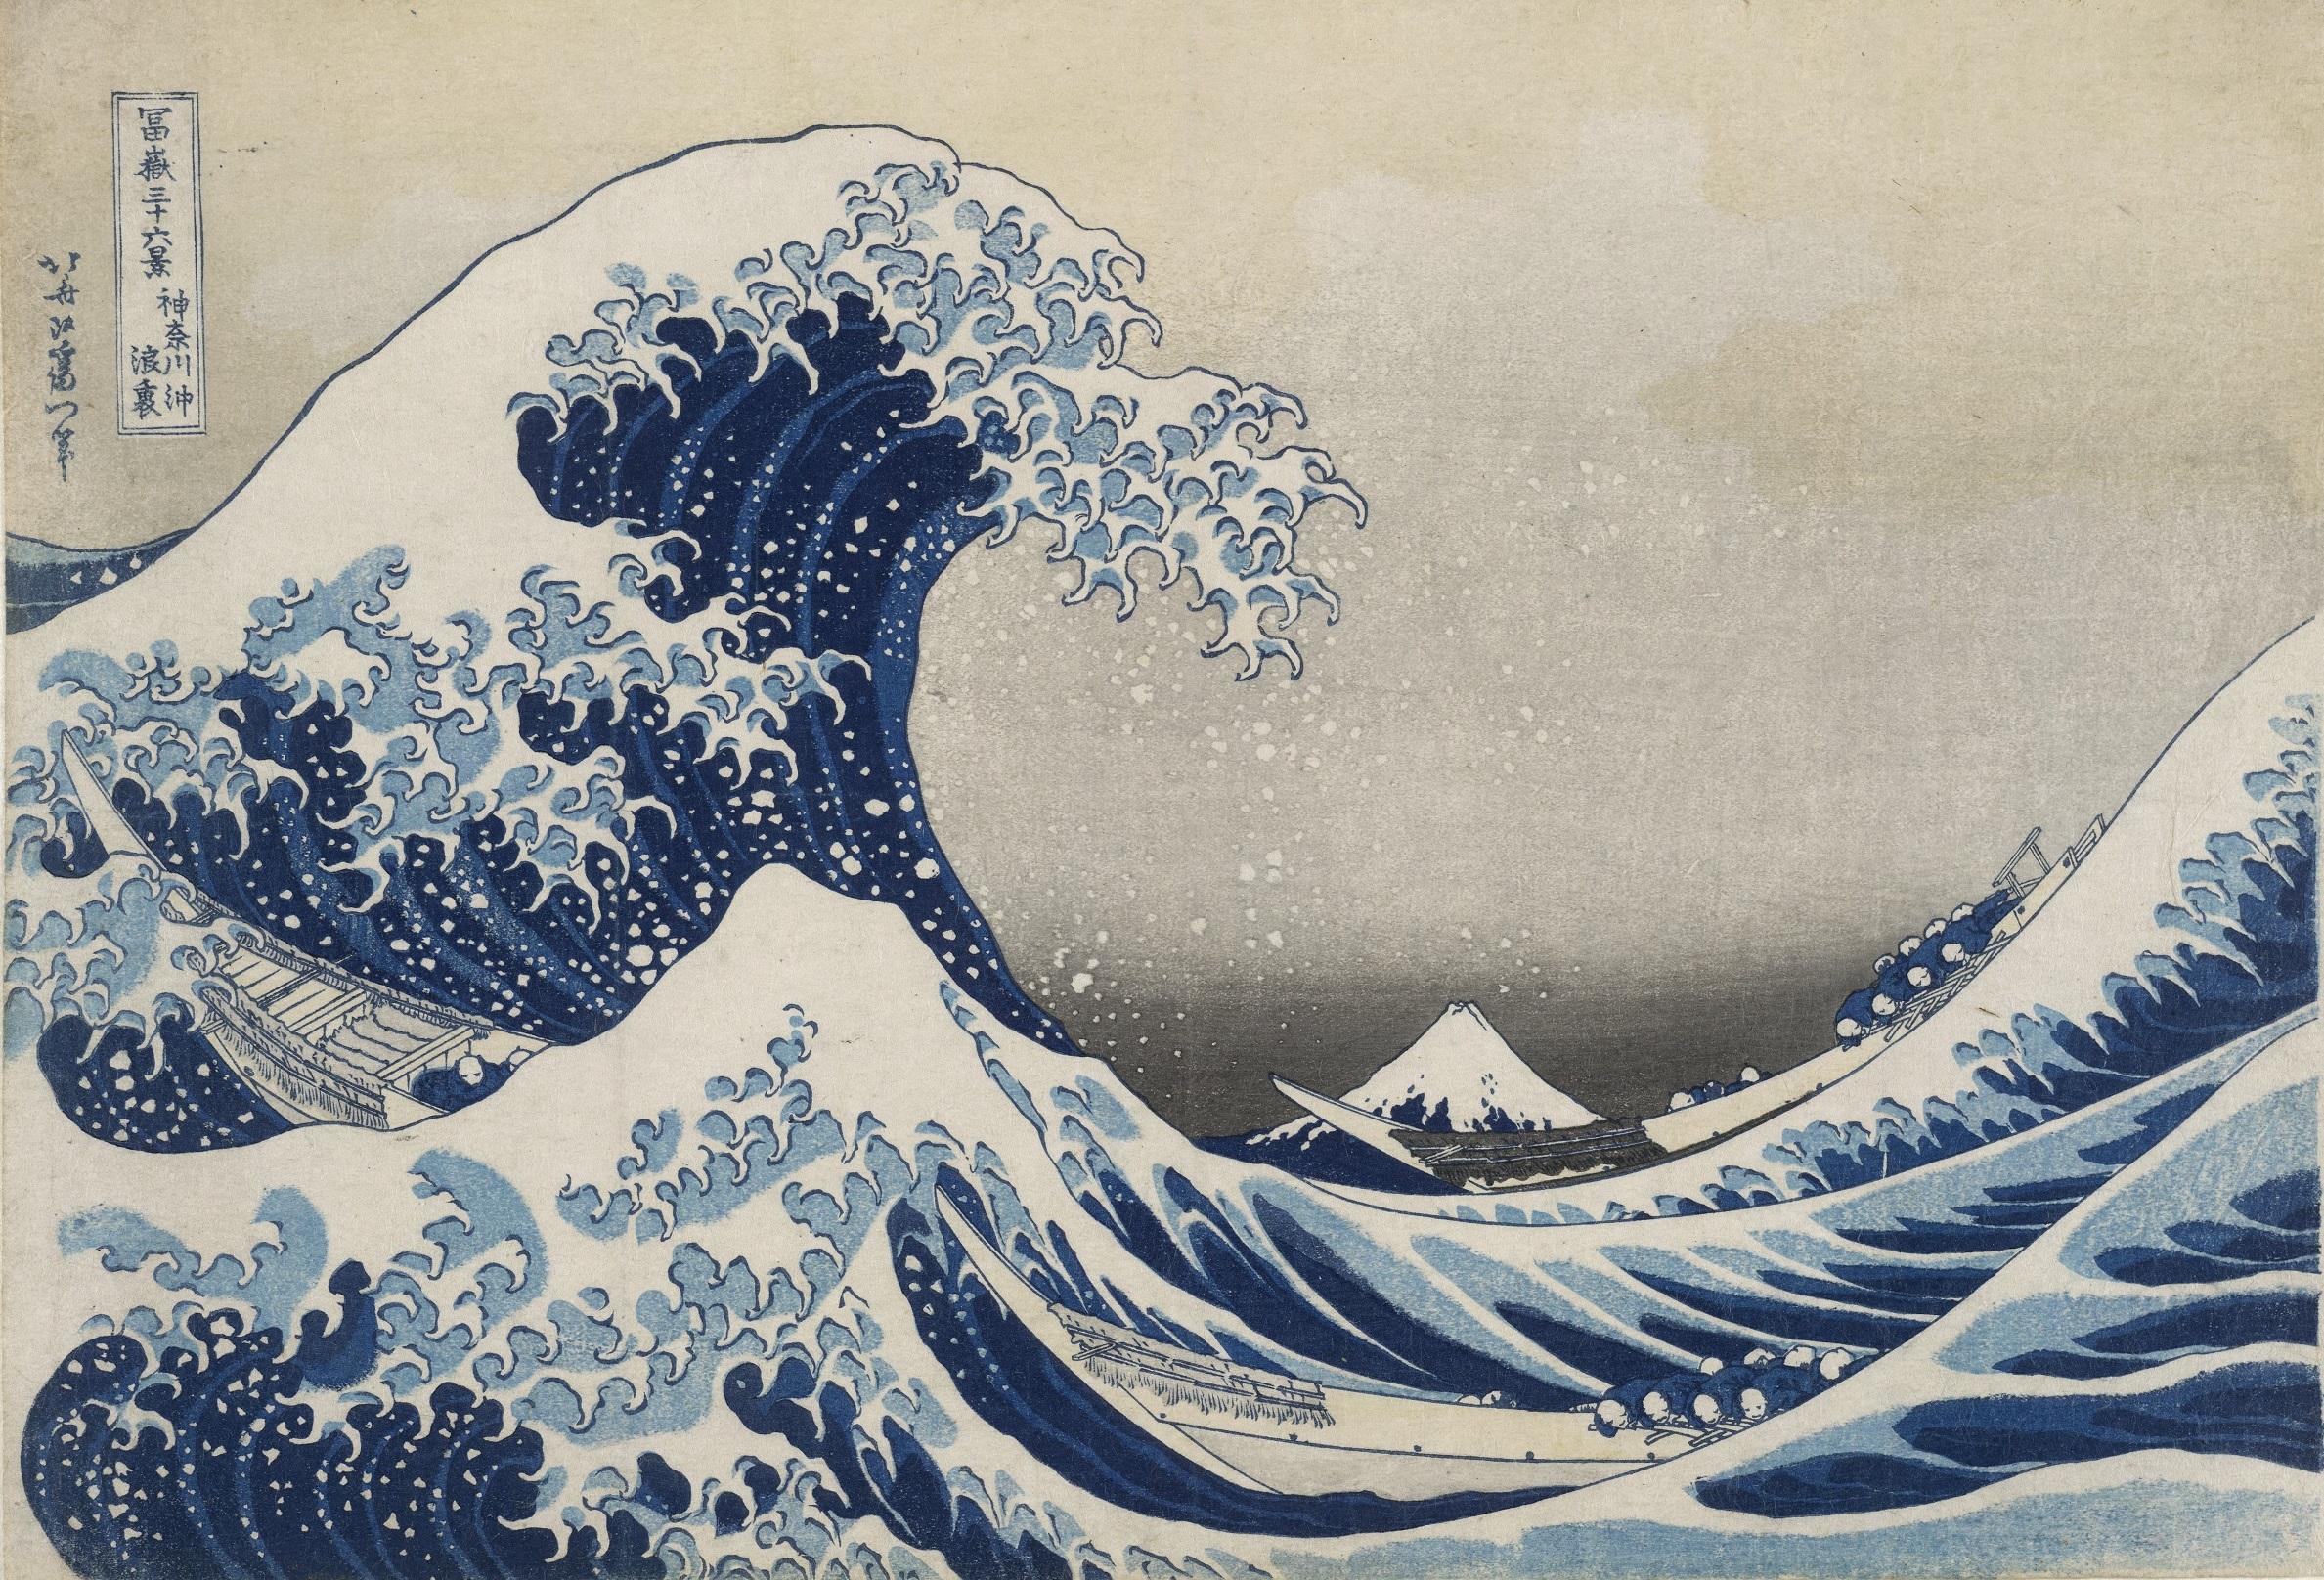 Hokusai's The Great Wave off Kanagawa